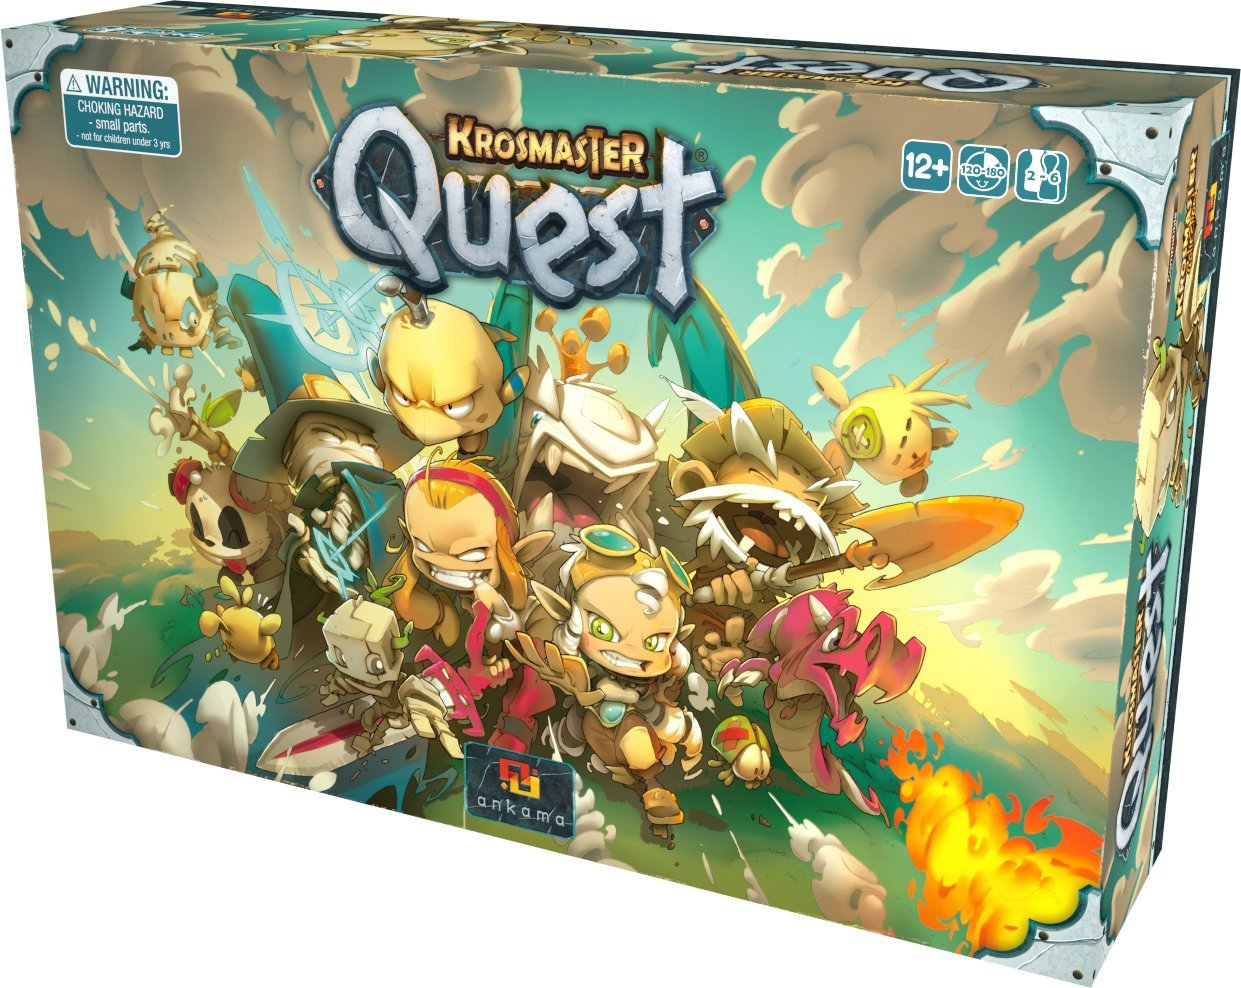 Krosmaster Quest Core Box Flat River Group KMQ001